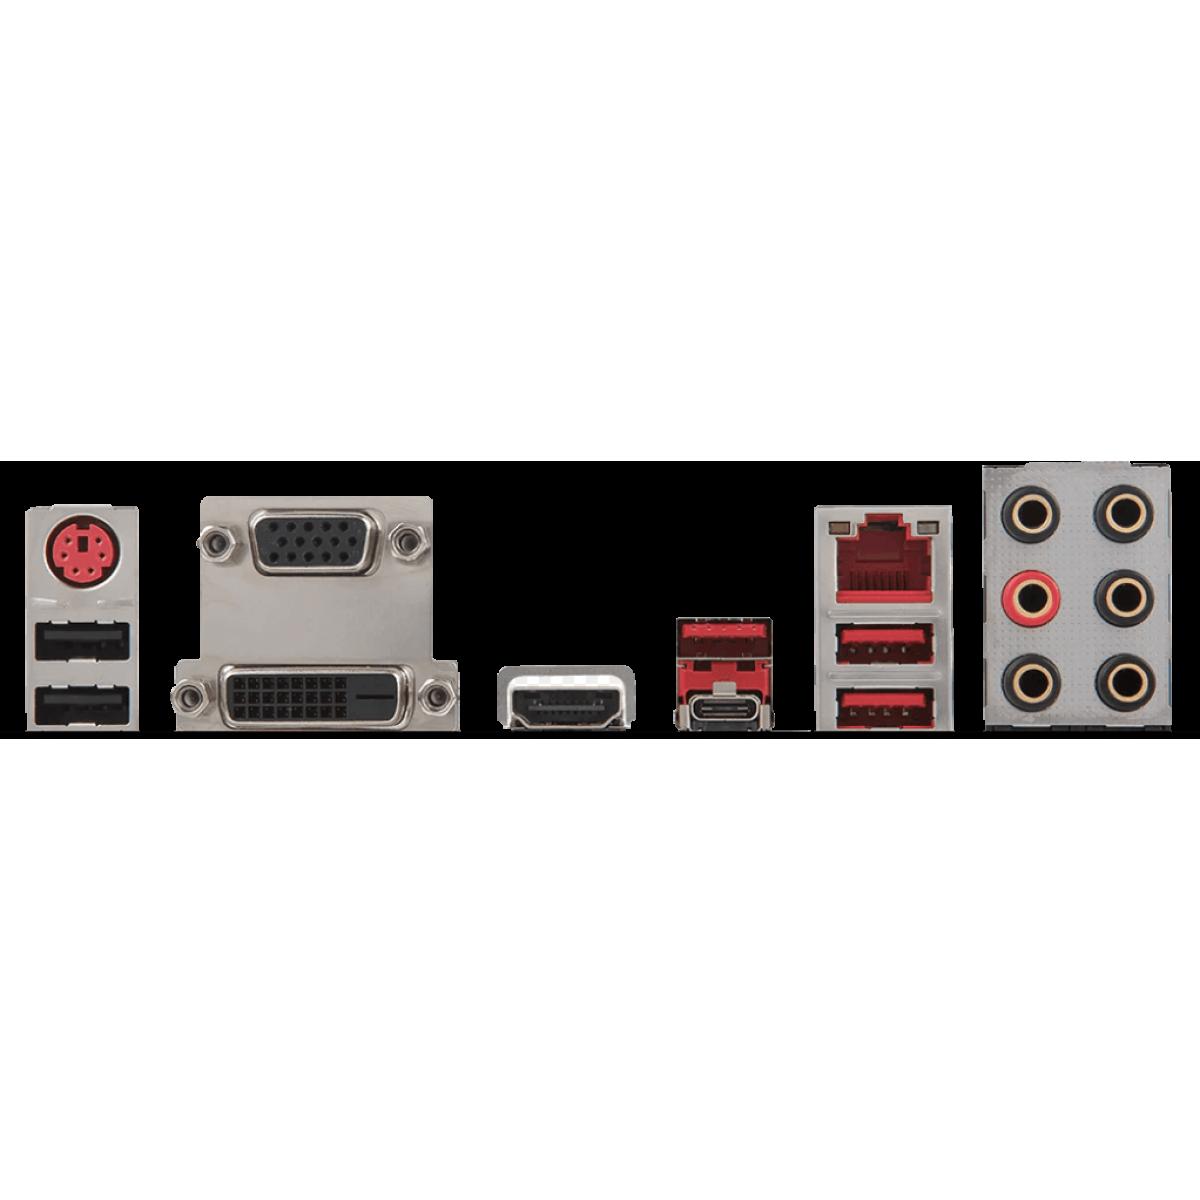 Placa Mãe MSI B350 Tomahawk Arctic, Chipset B350, AMD AM4, ATX, DDR4